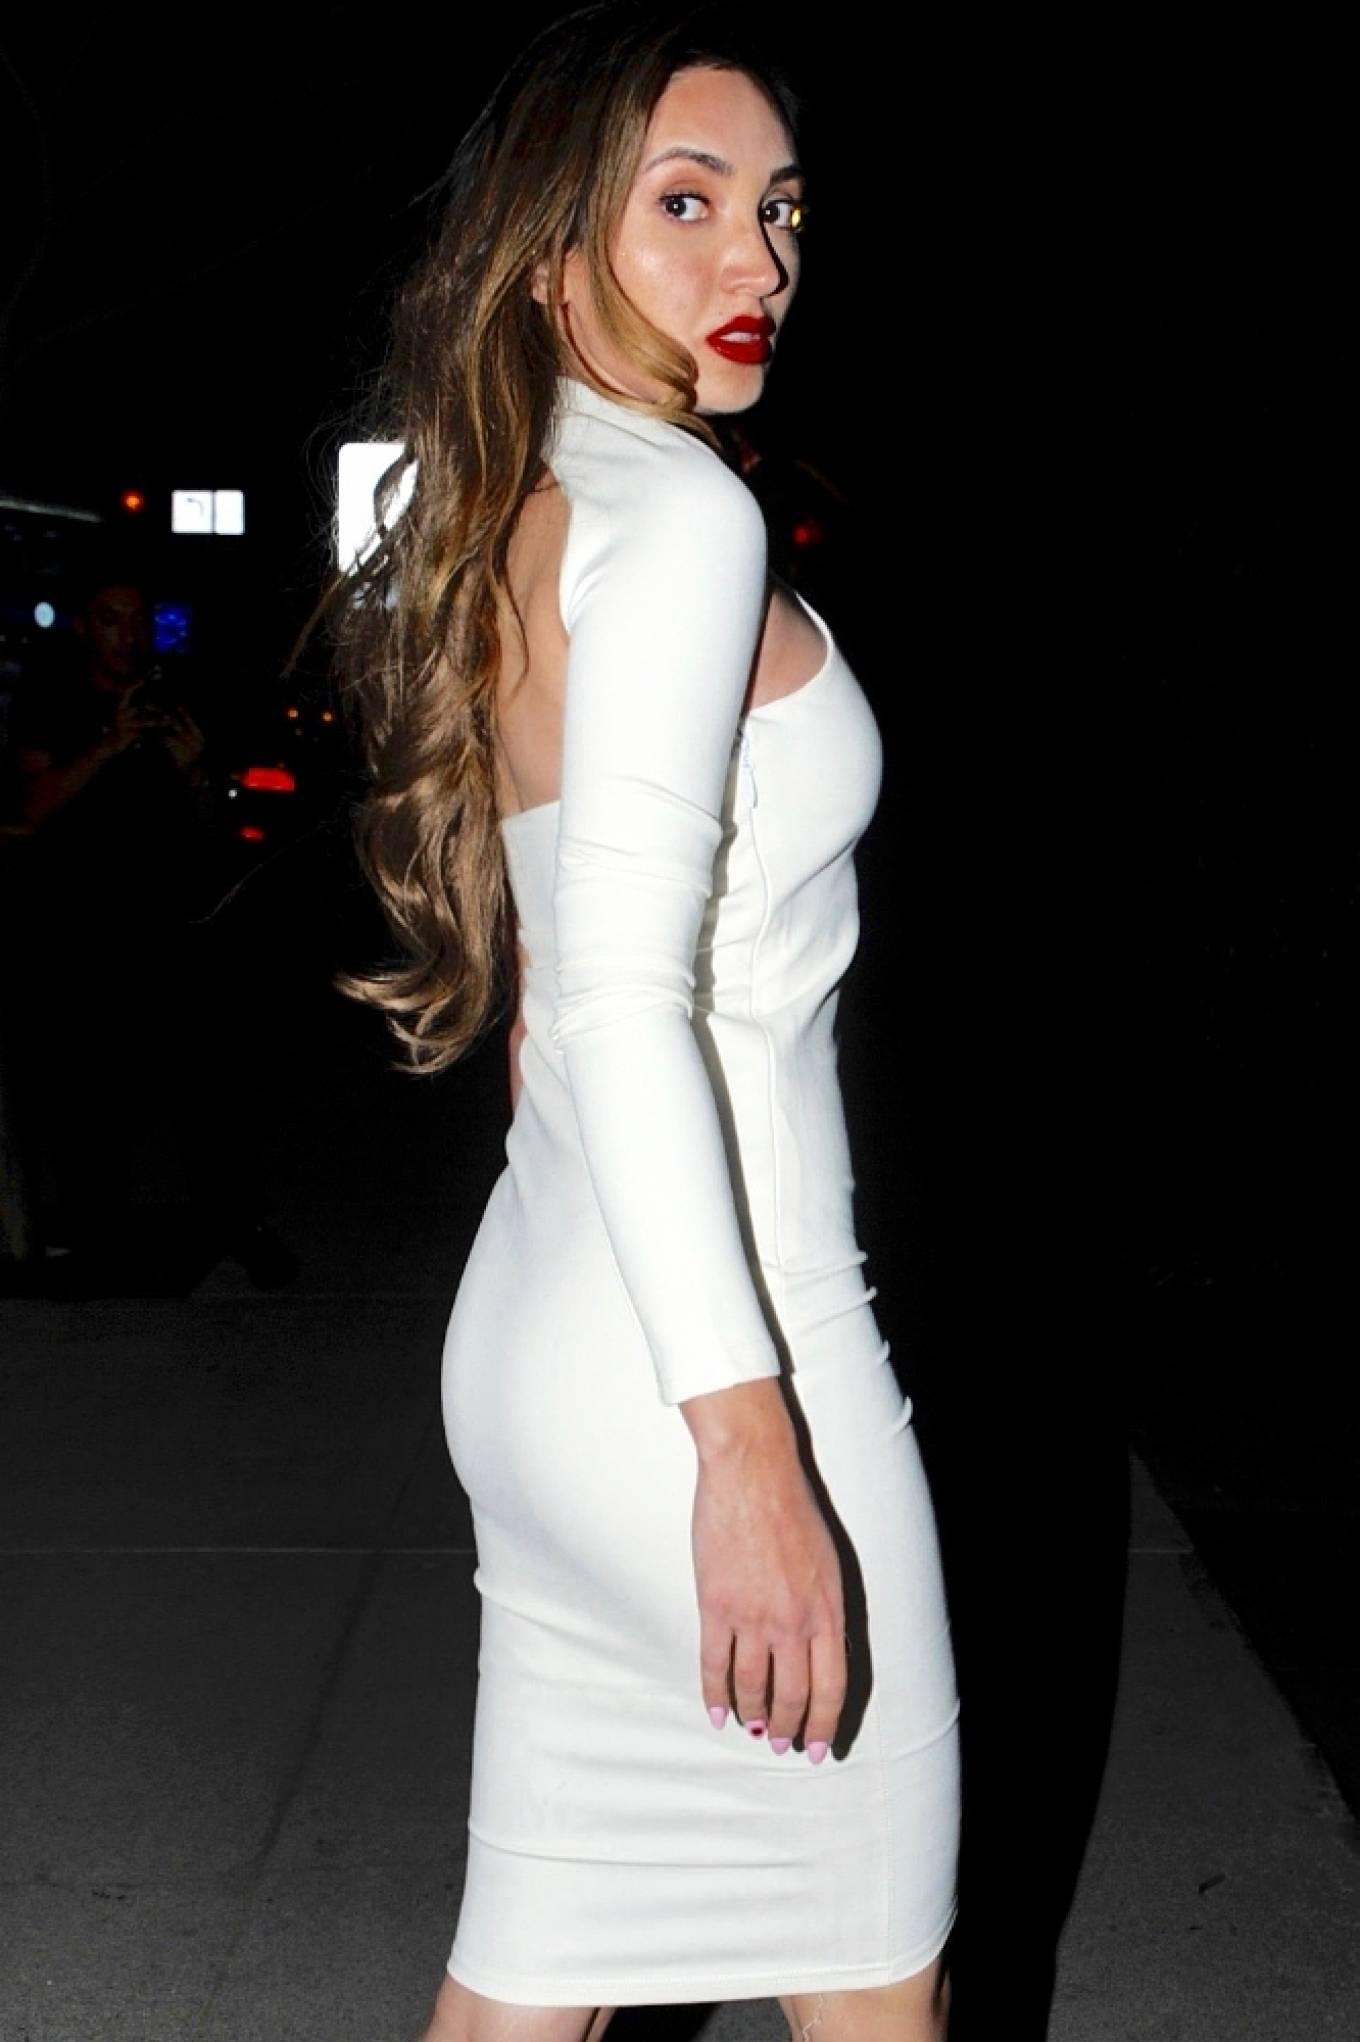 Megan Pormer 2021 : Megan Pormer – In white tight dress going to Nusr-Et Steakhouse in Beverly Hills-07